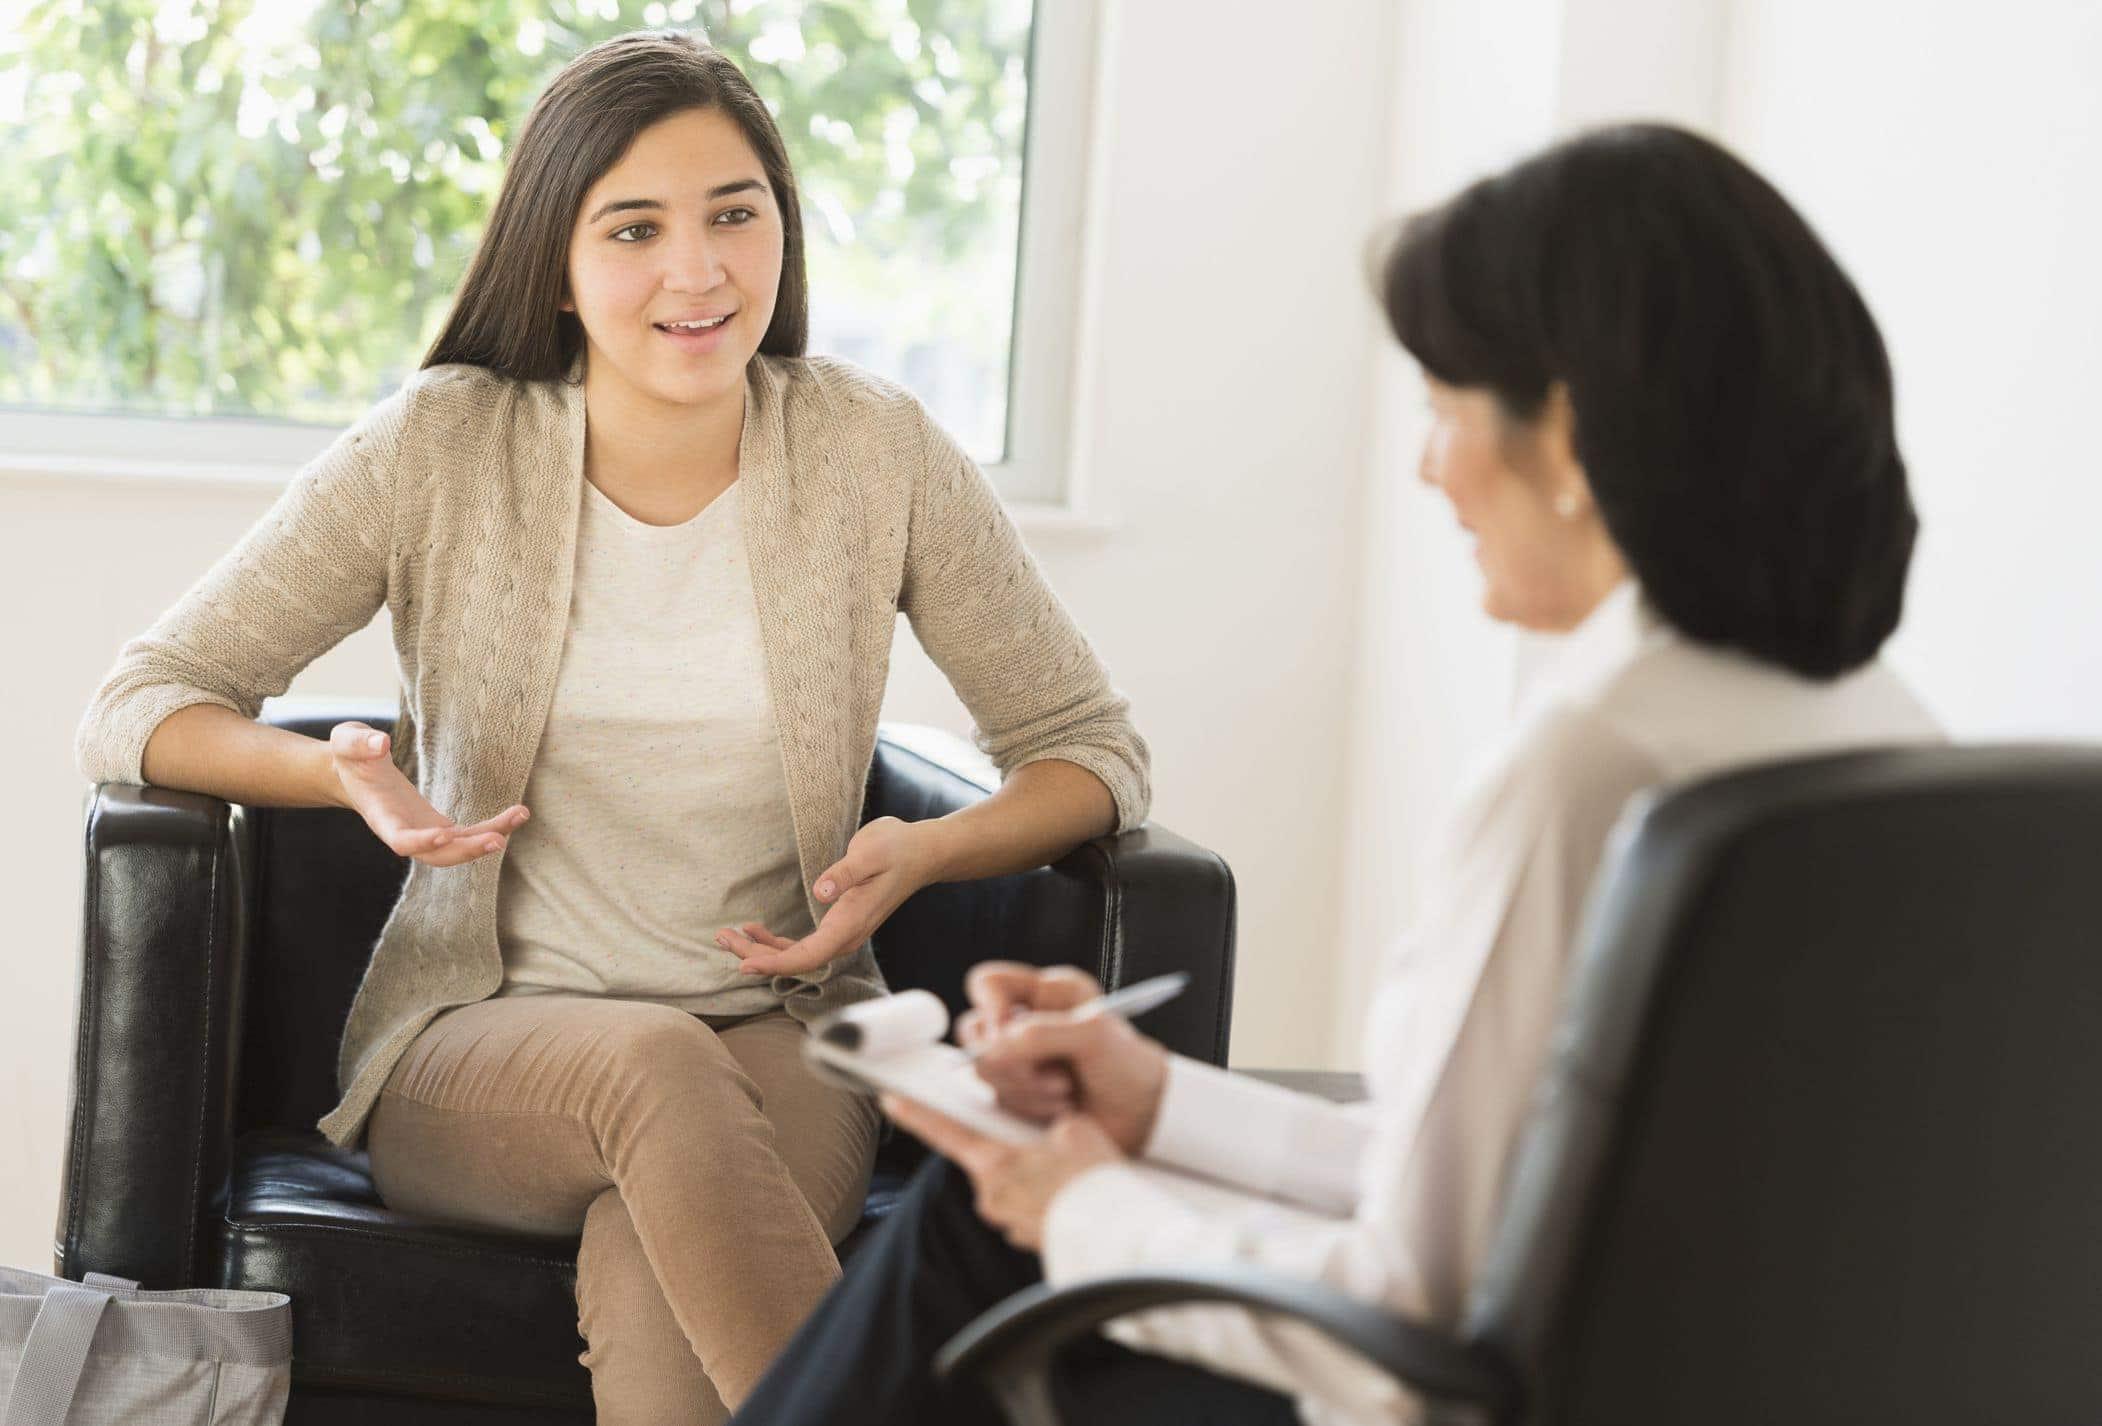 terapia cognitiva comportamental para a infância e adolescência